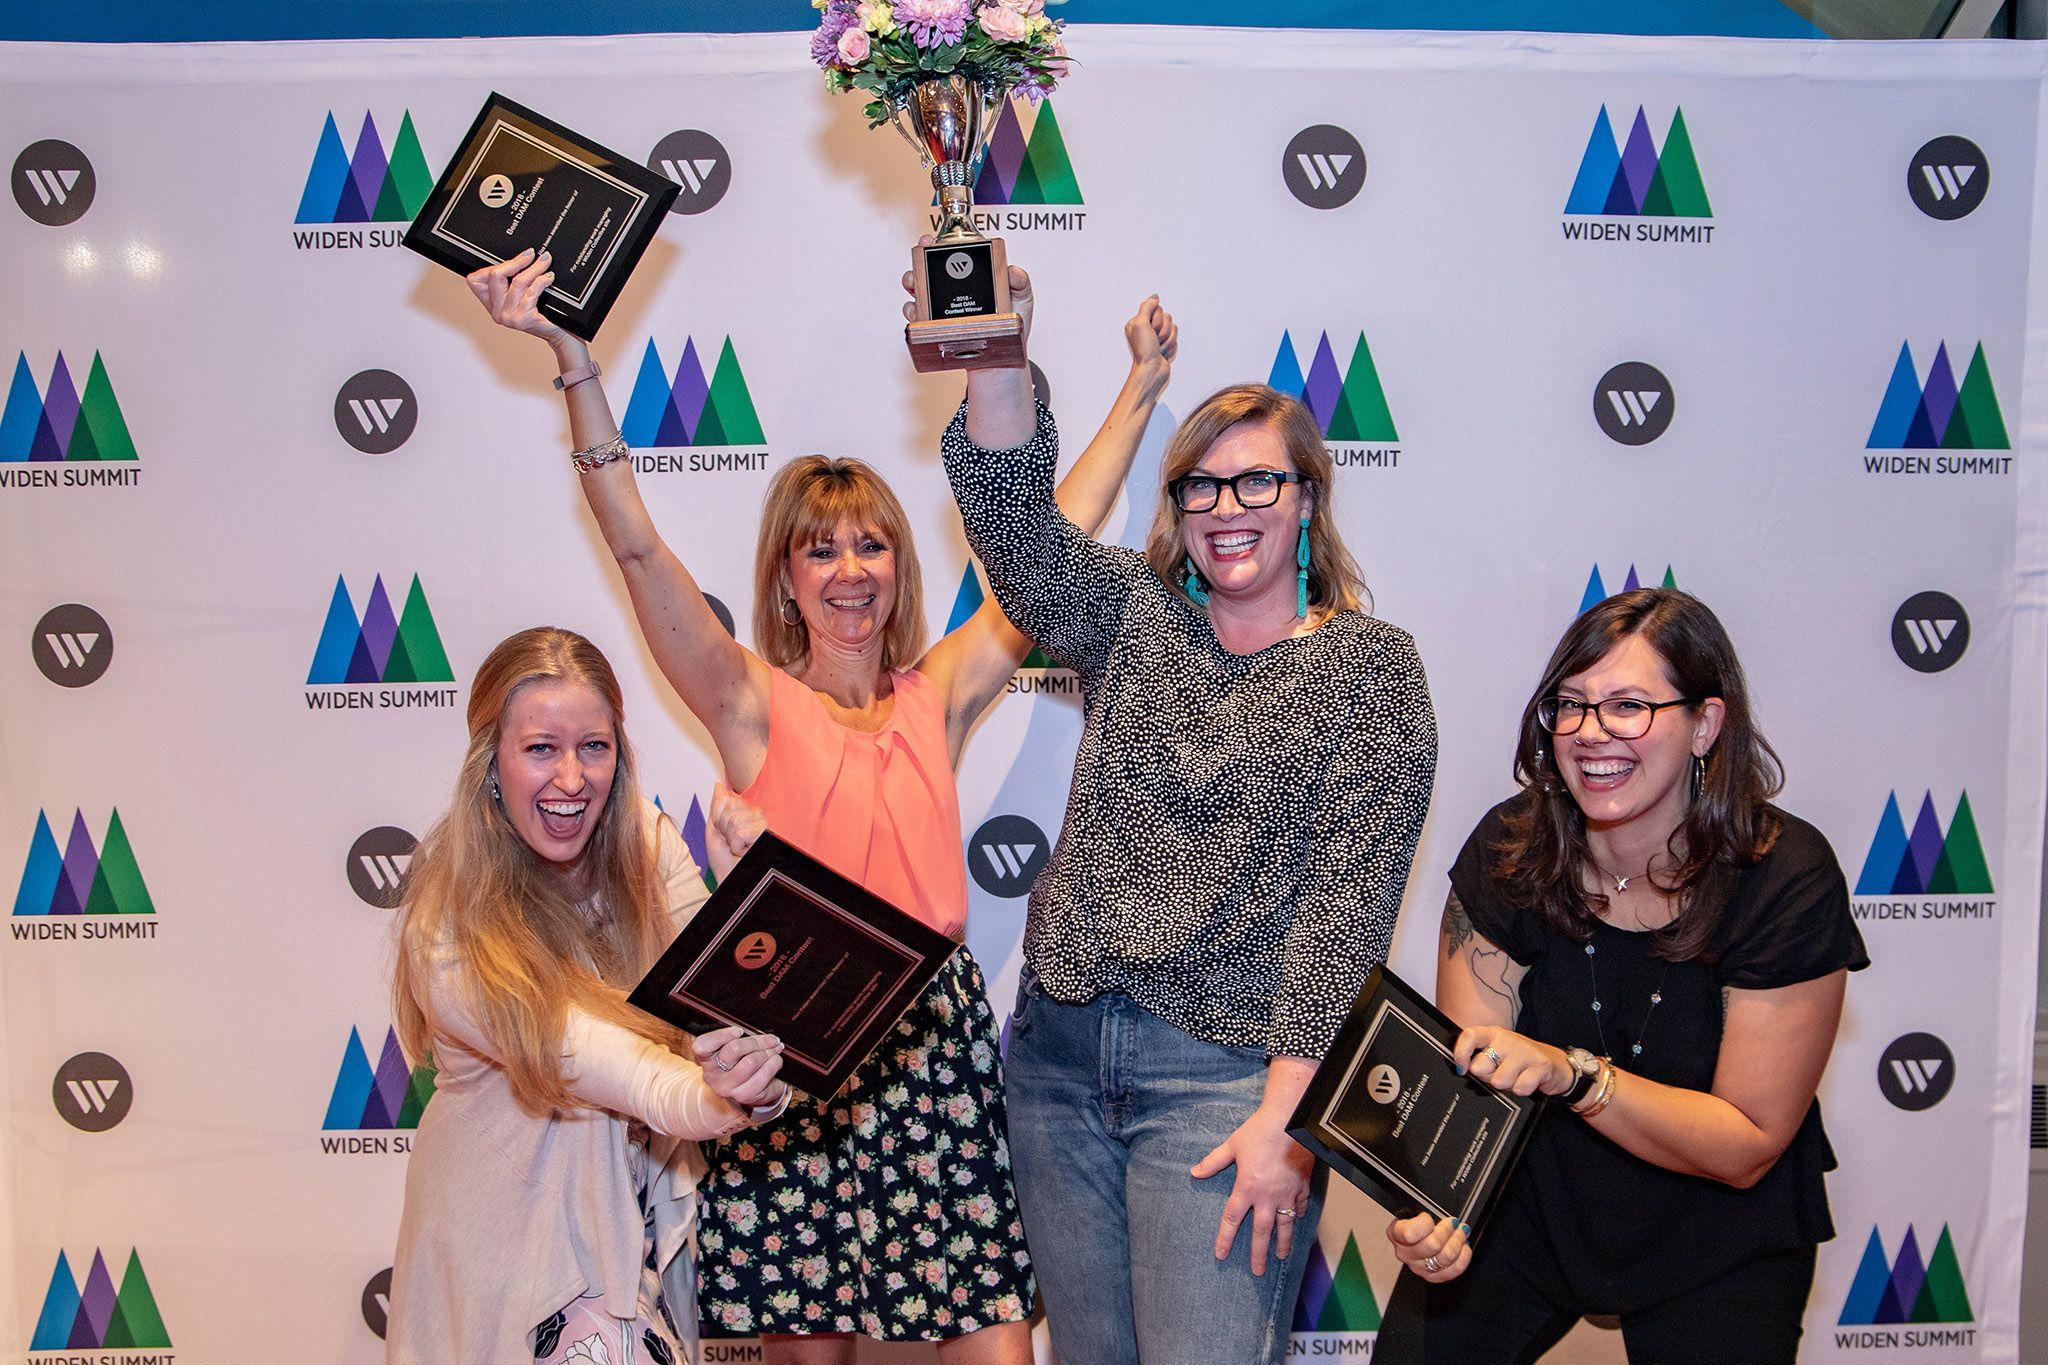 Best DAM Contest Awards 2018